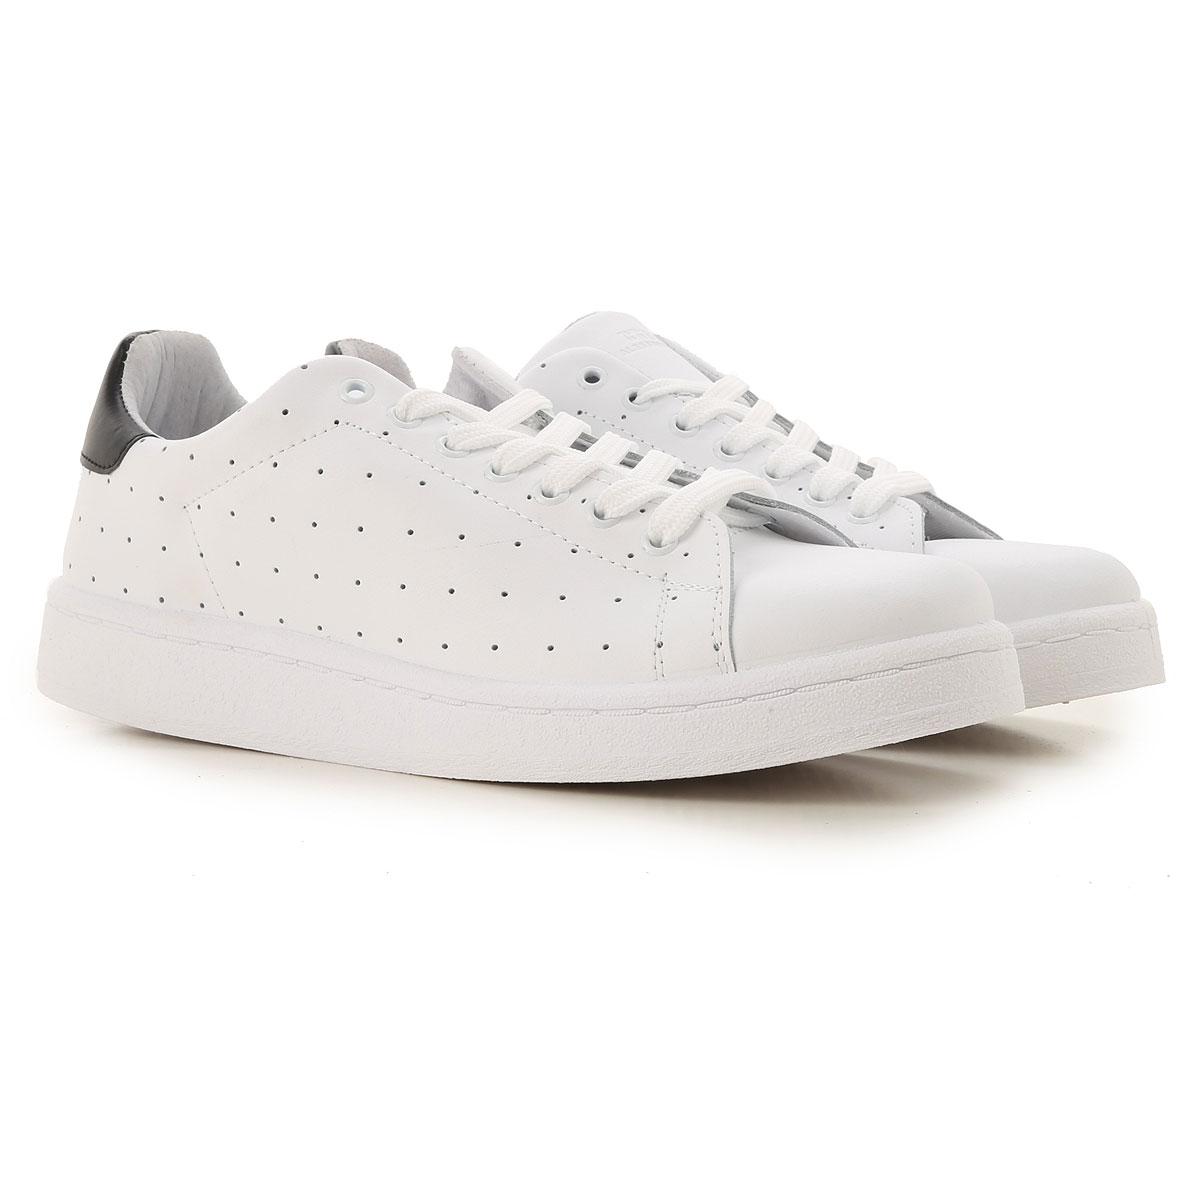 Daniele Alessandrini Sneaker Homme, Blanc, Cuir, 2017, 40 41 42 43